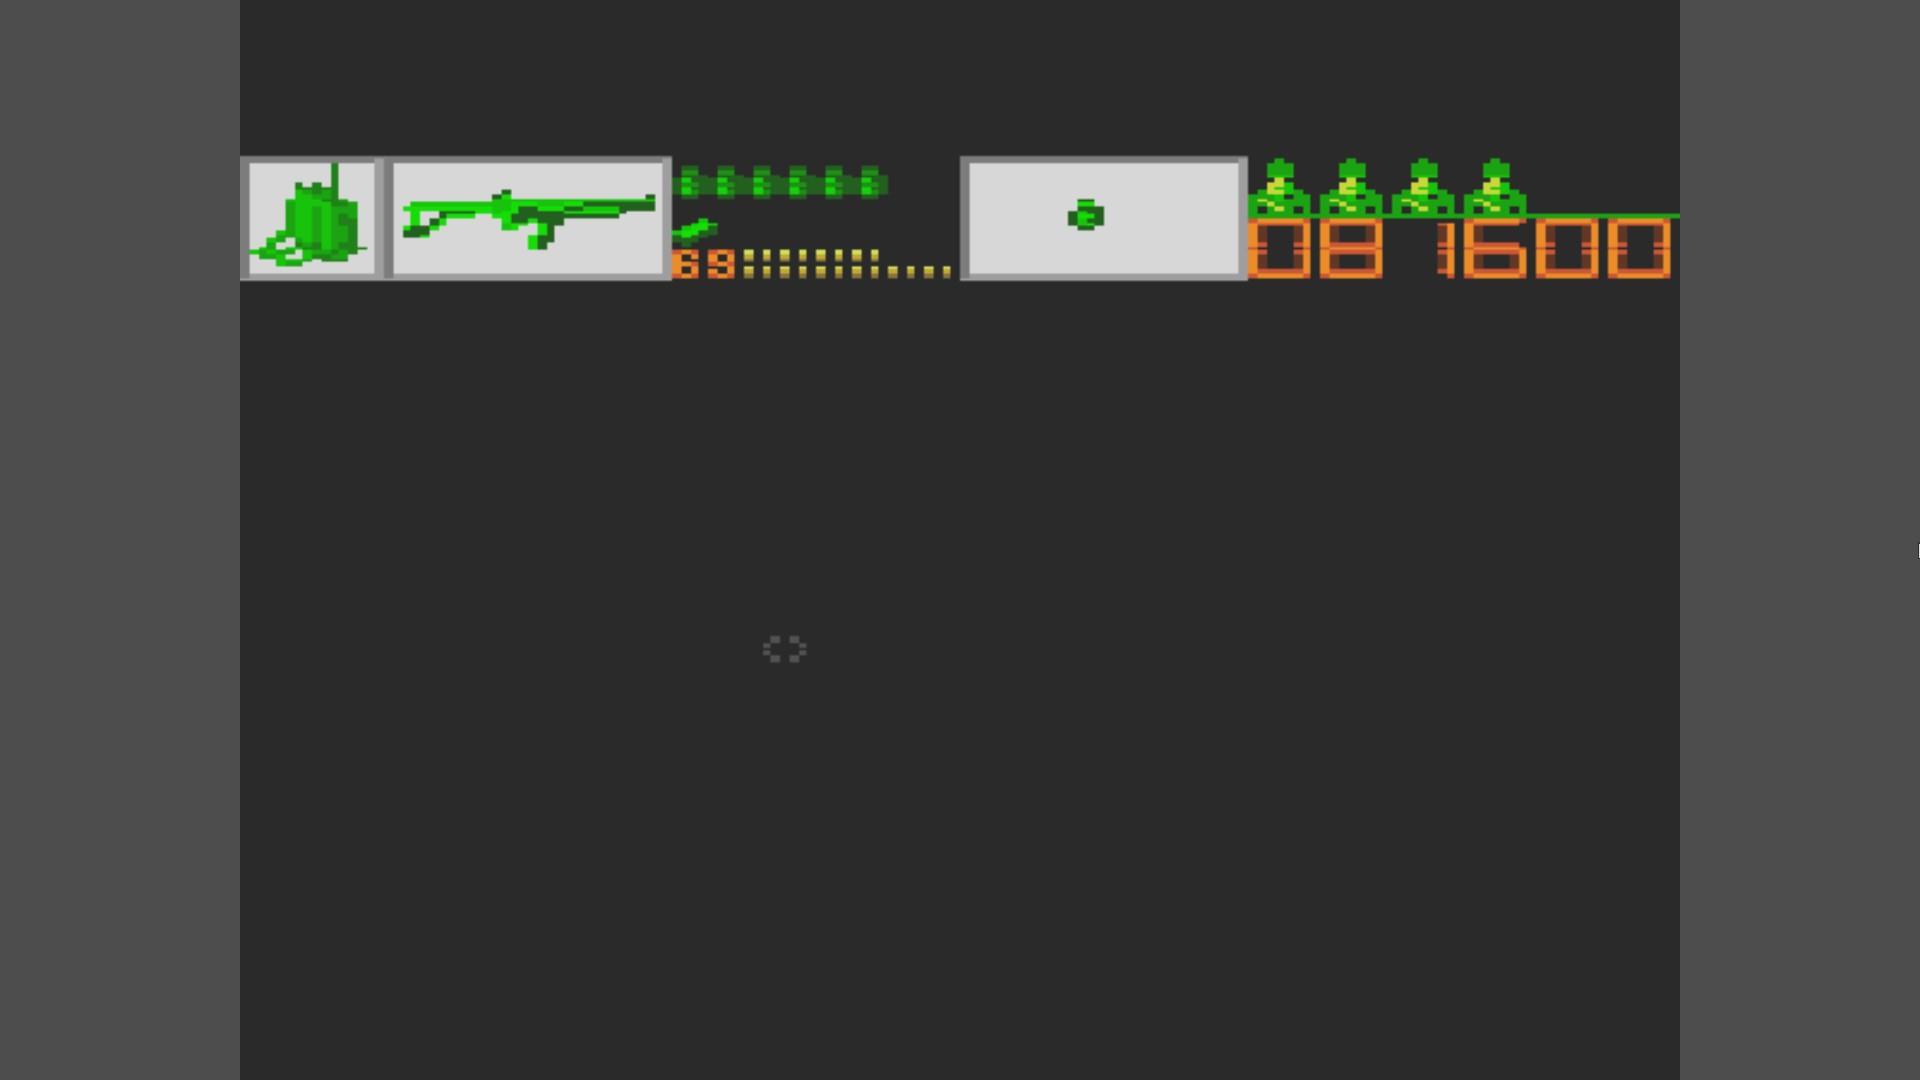 AkinNahtanoj: Alien Brigade: Standard (Atari 7800 Emulated) 81,600 points on 2020-10-09 06:12:43